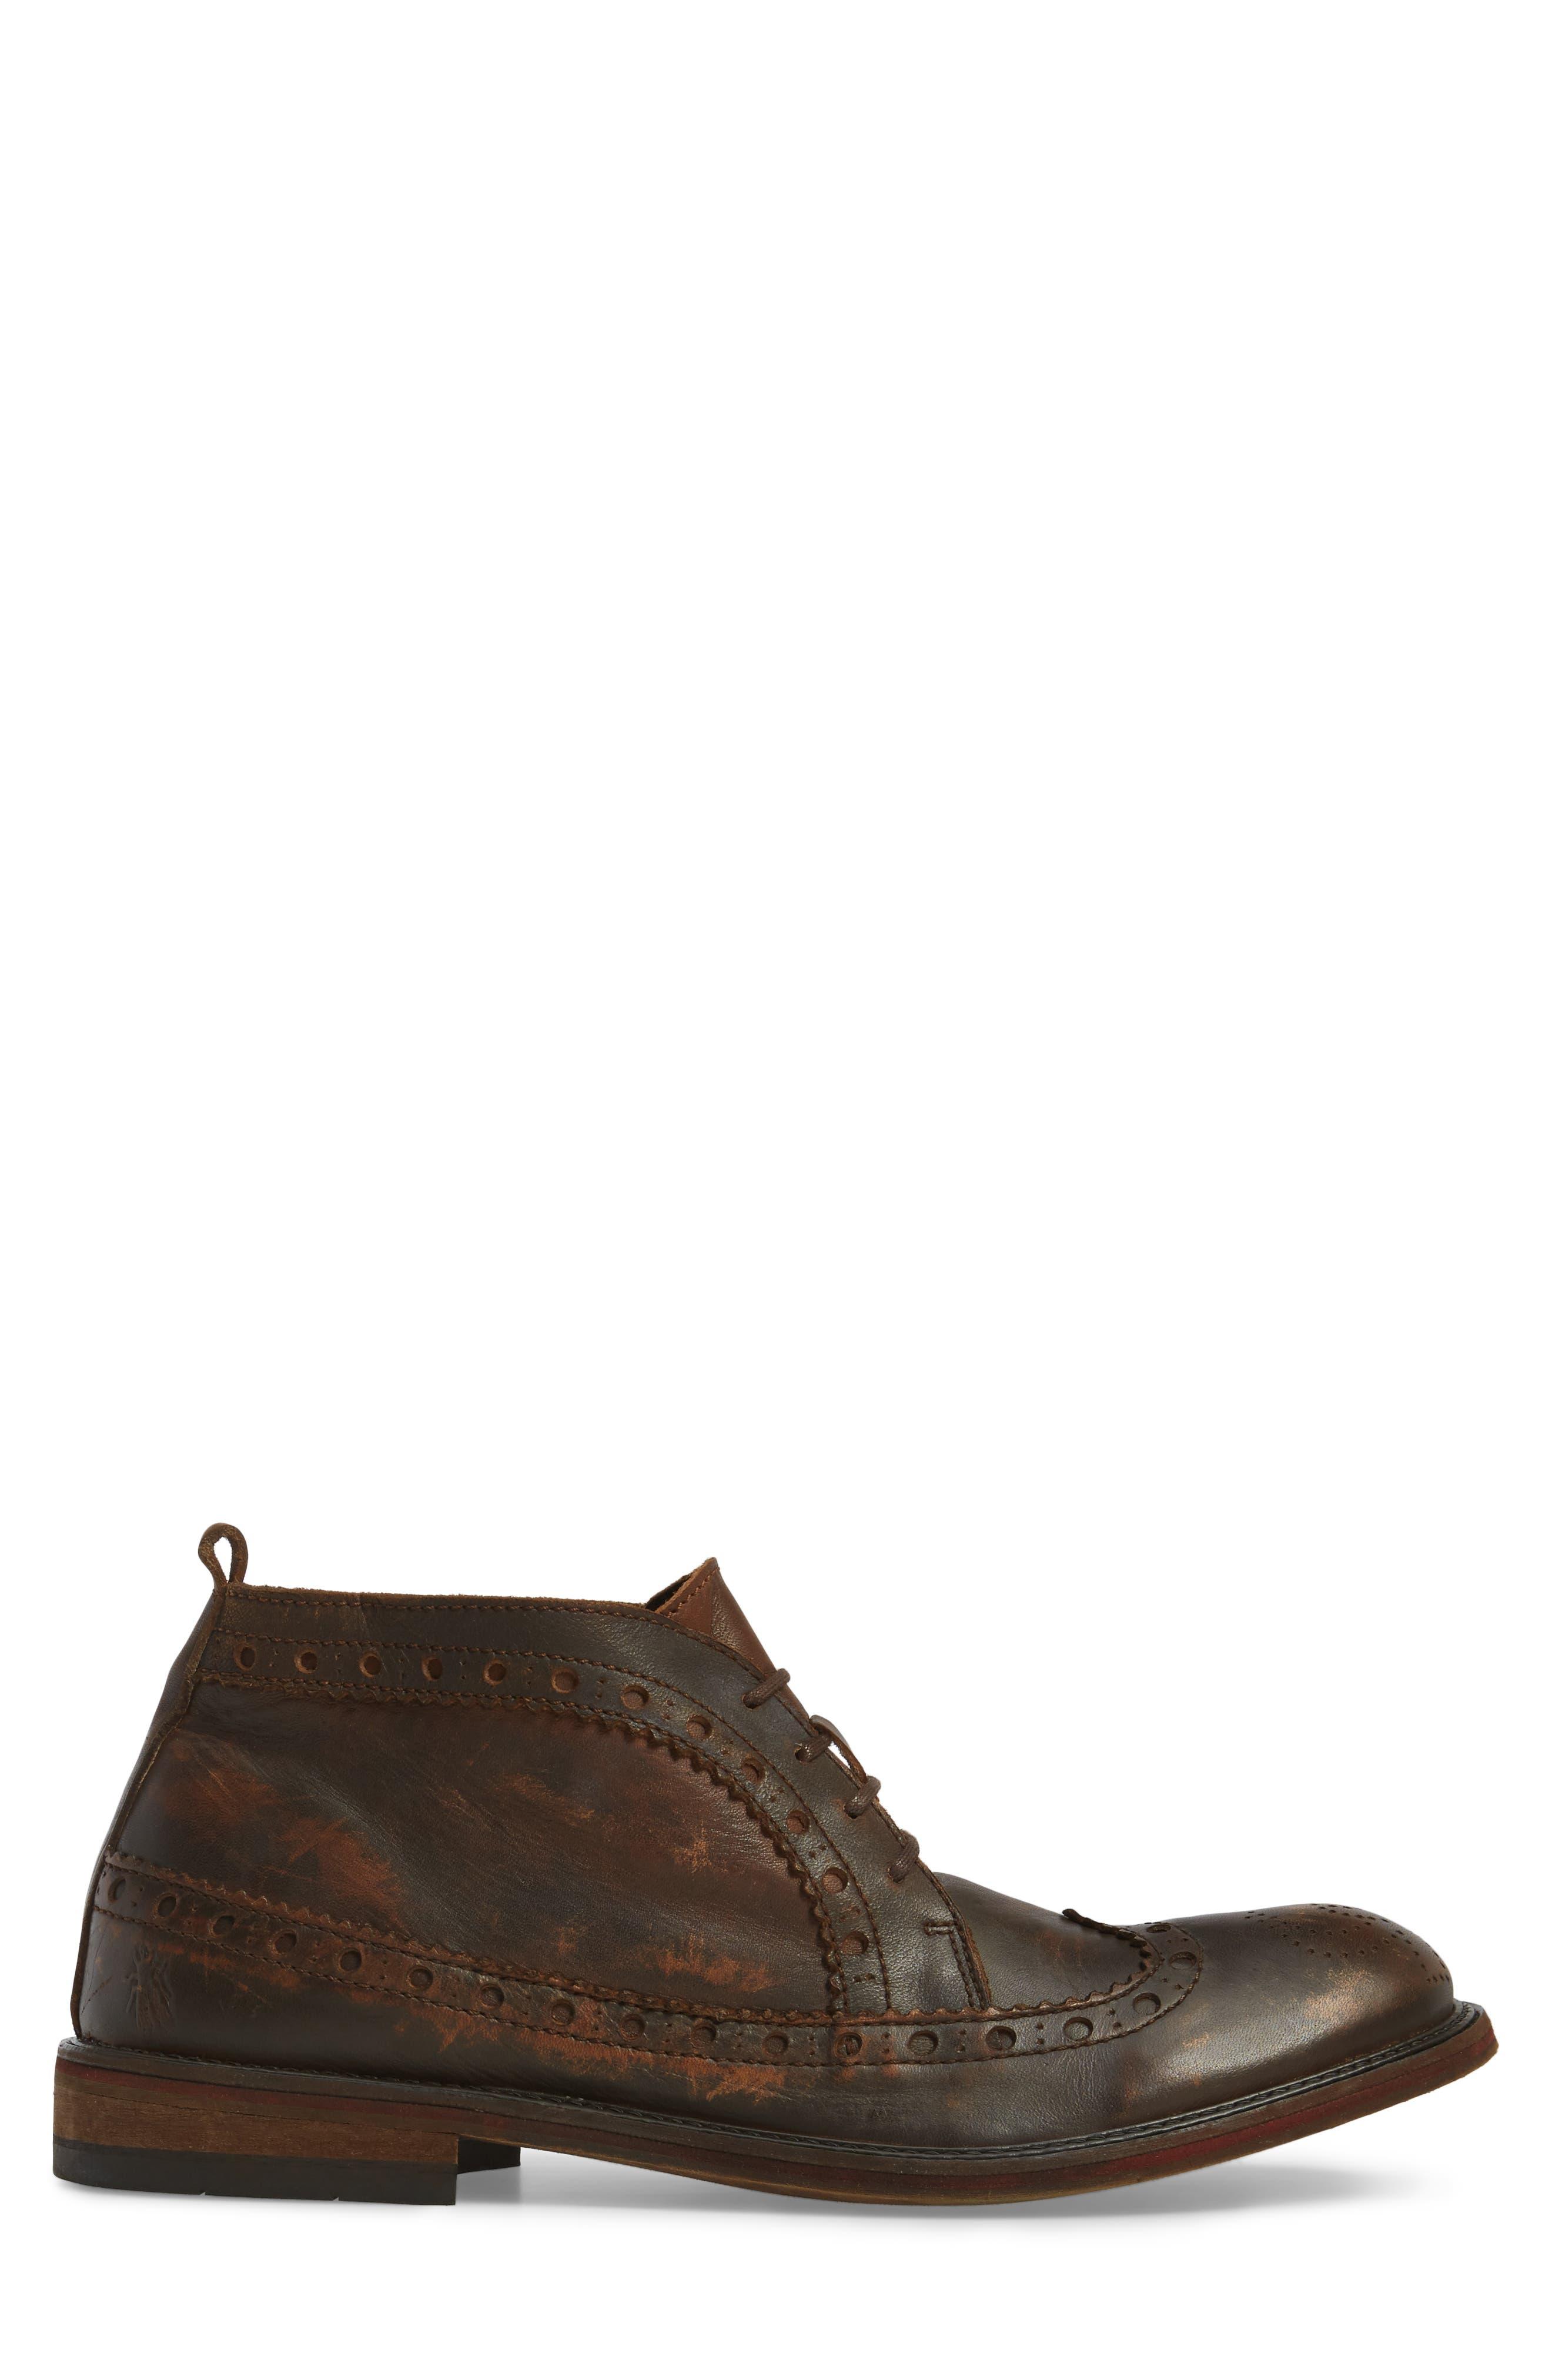 Alternate Image 3  - Fly London Wile Wingtip Chukka Boot (Men)